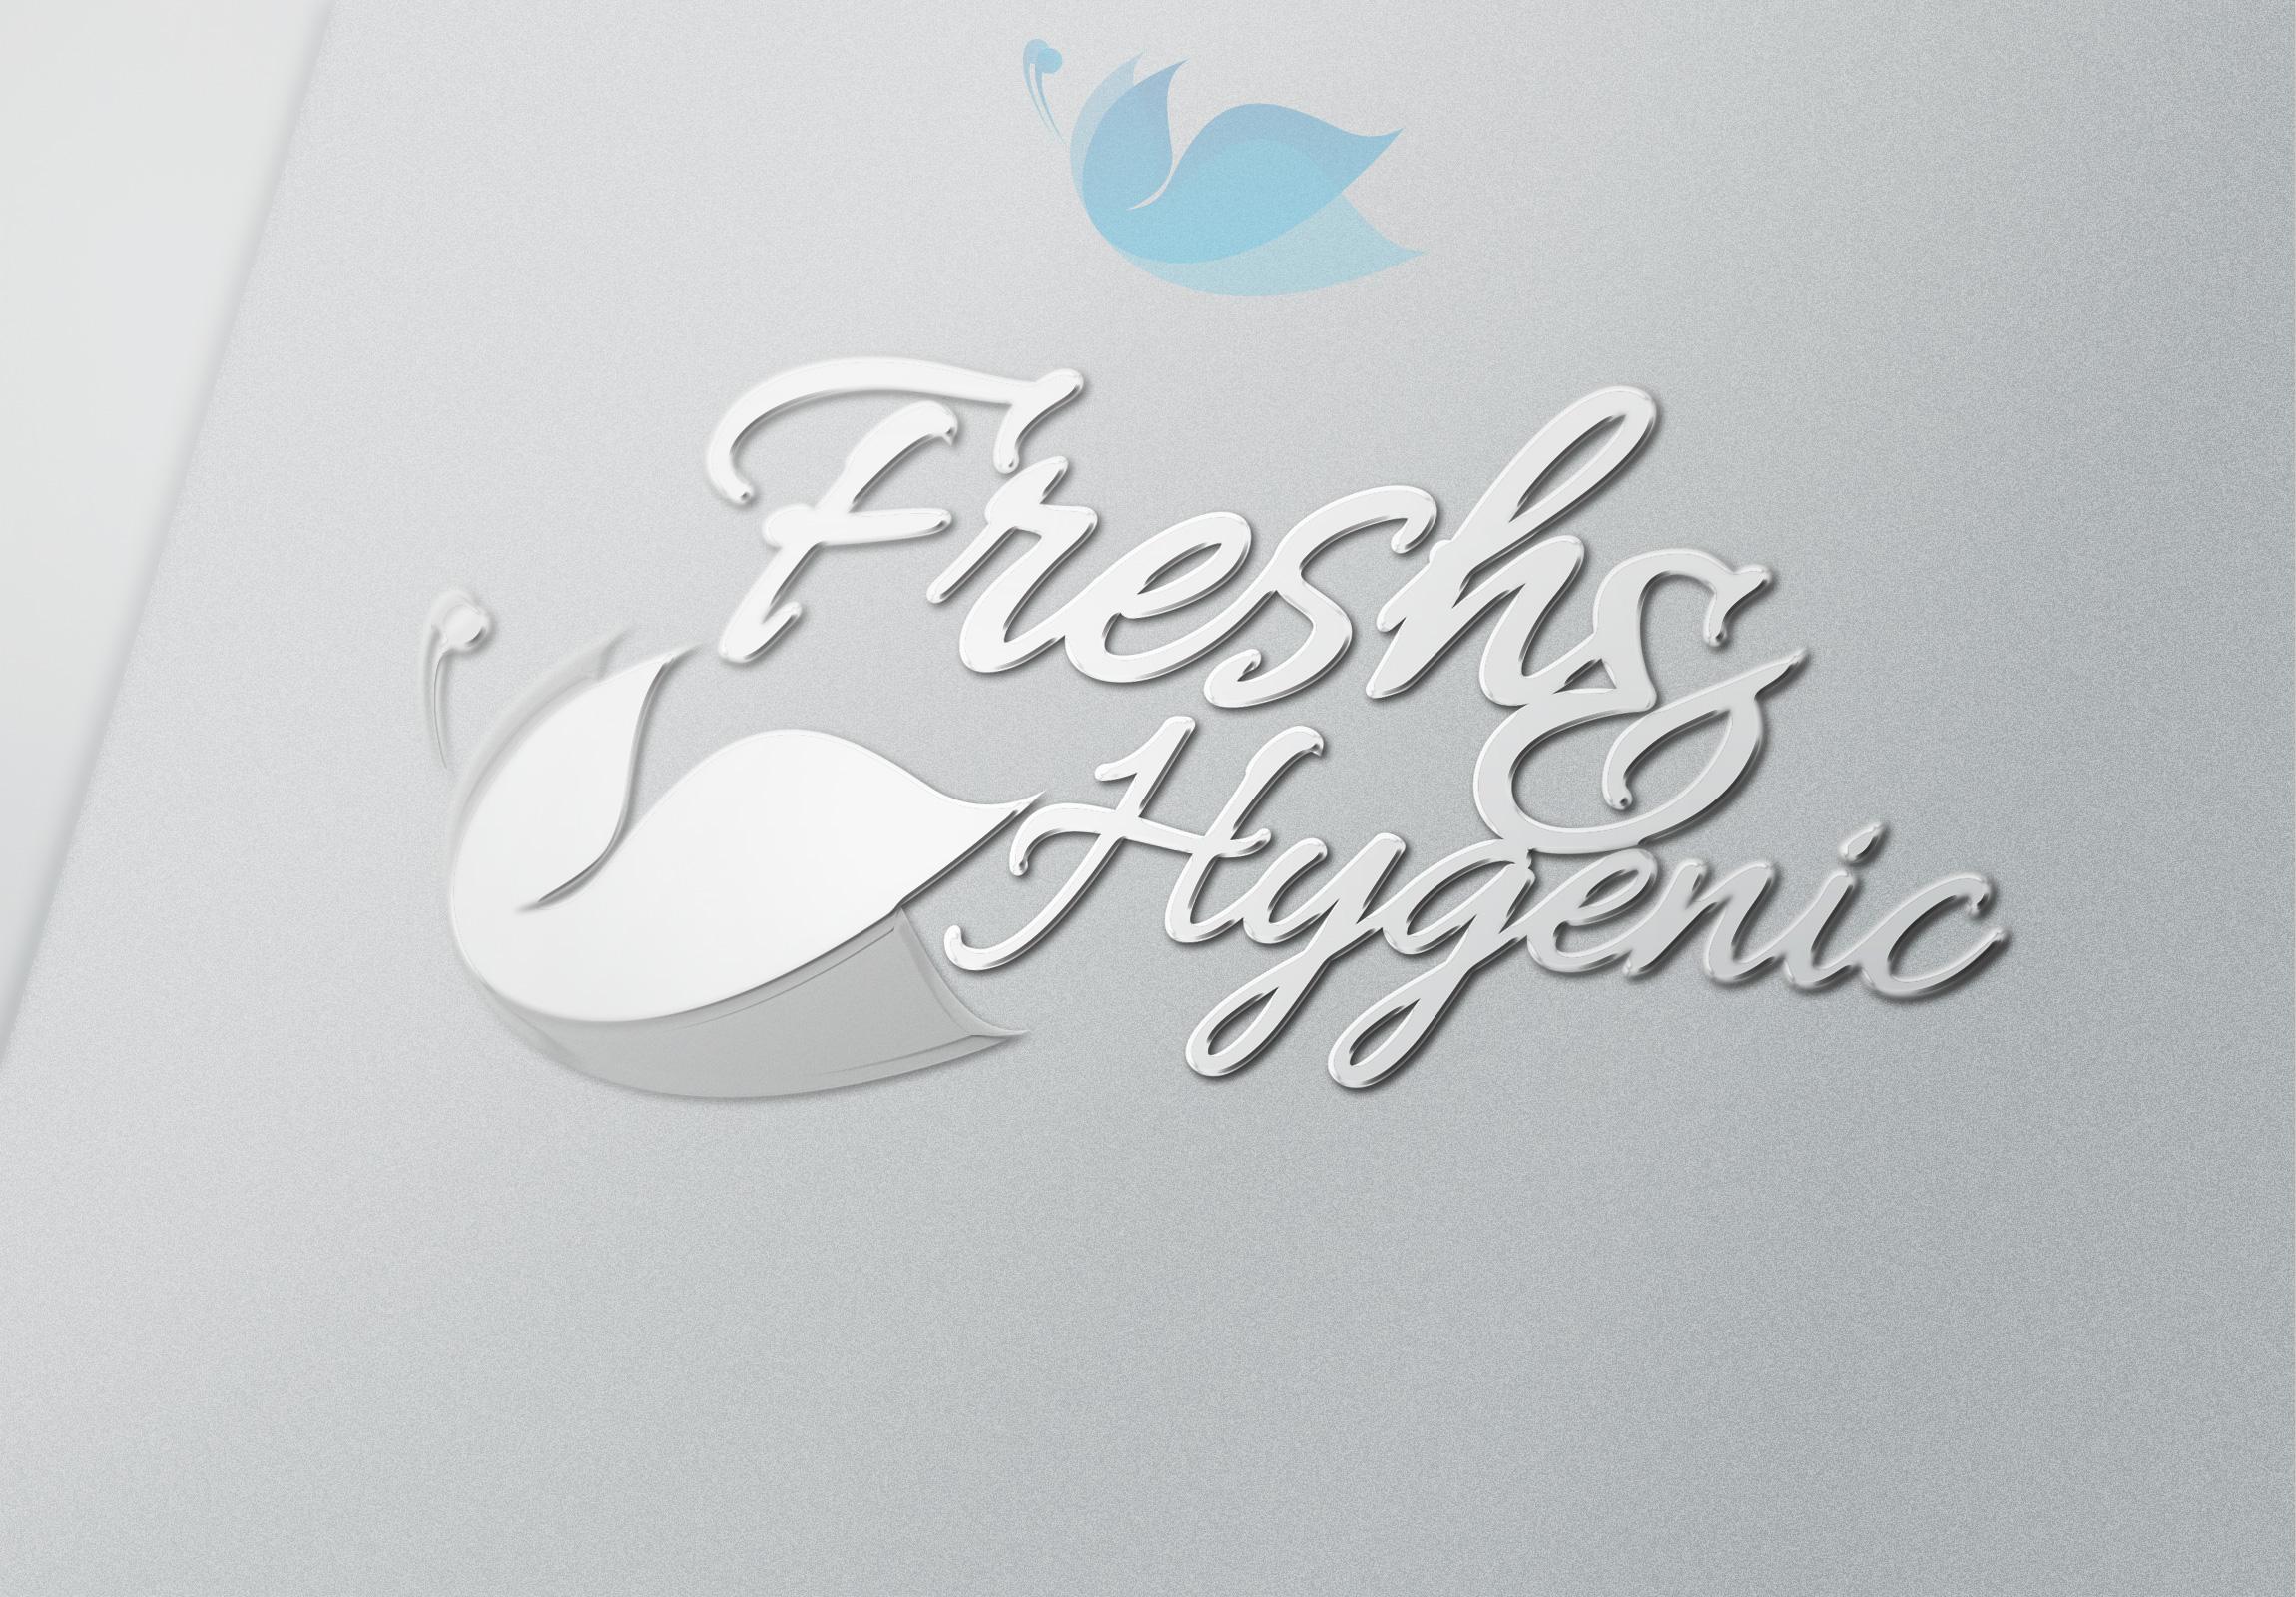 Logo Design by olii - Entry No. 155 in the Logo Design Contest Fun Logo Design for Fresh & Hygenic.